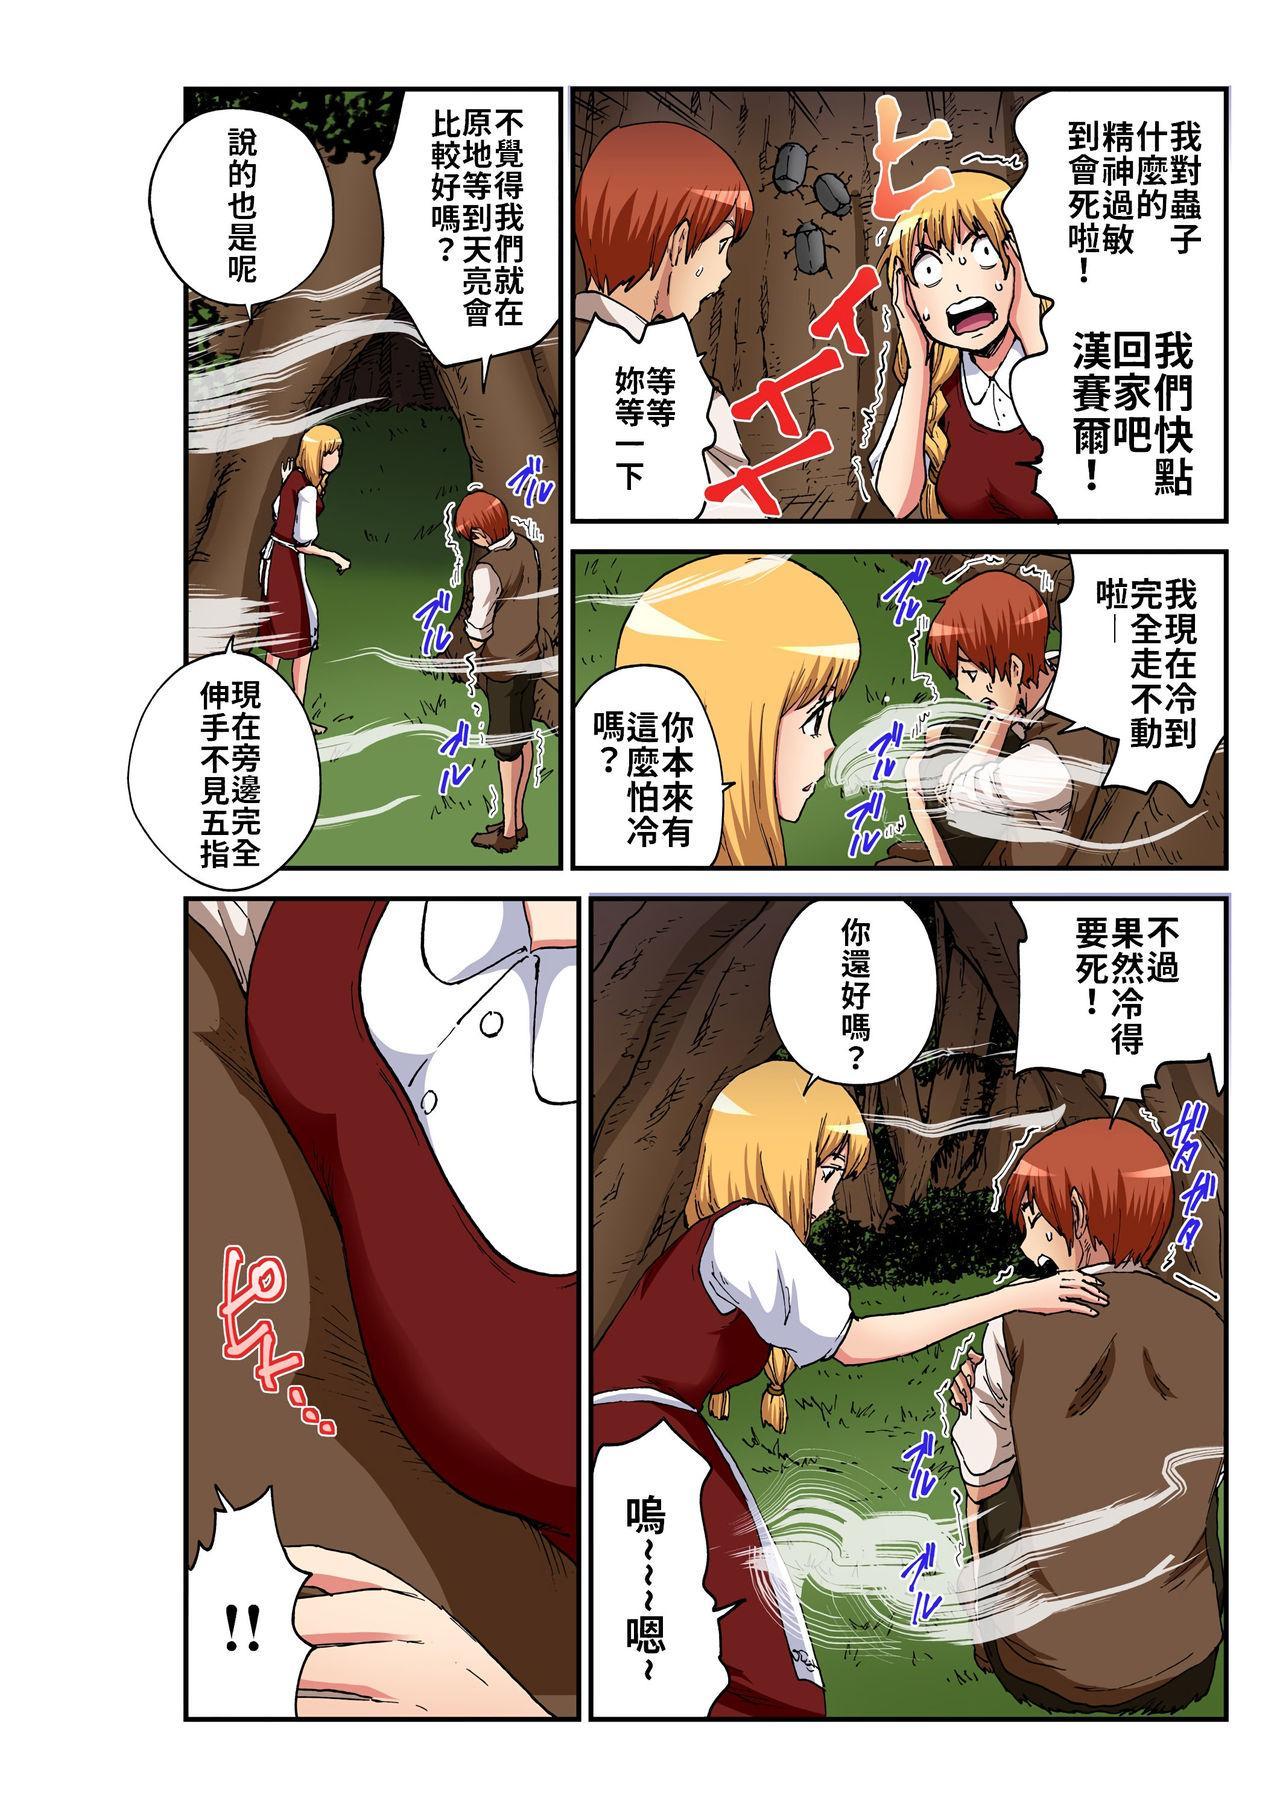 Otona no Douwa ~Henzeru to Gure-teru   大人的童話~糖果屋 4